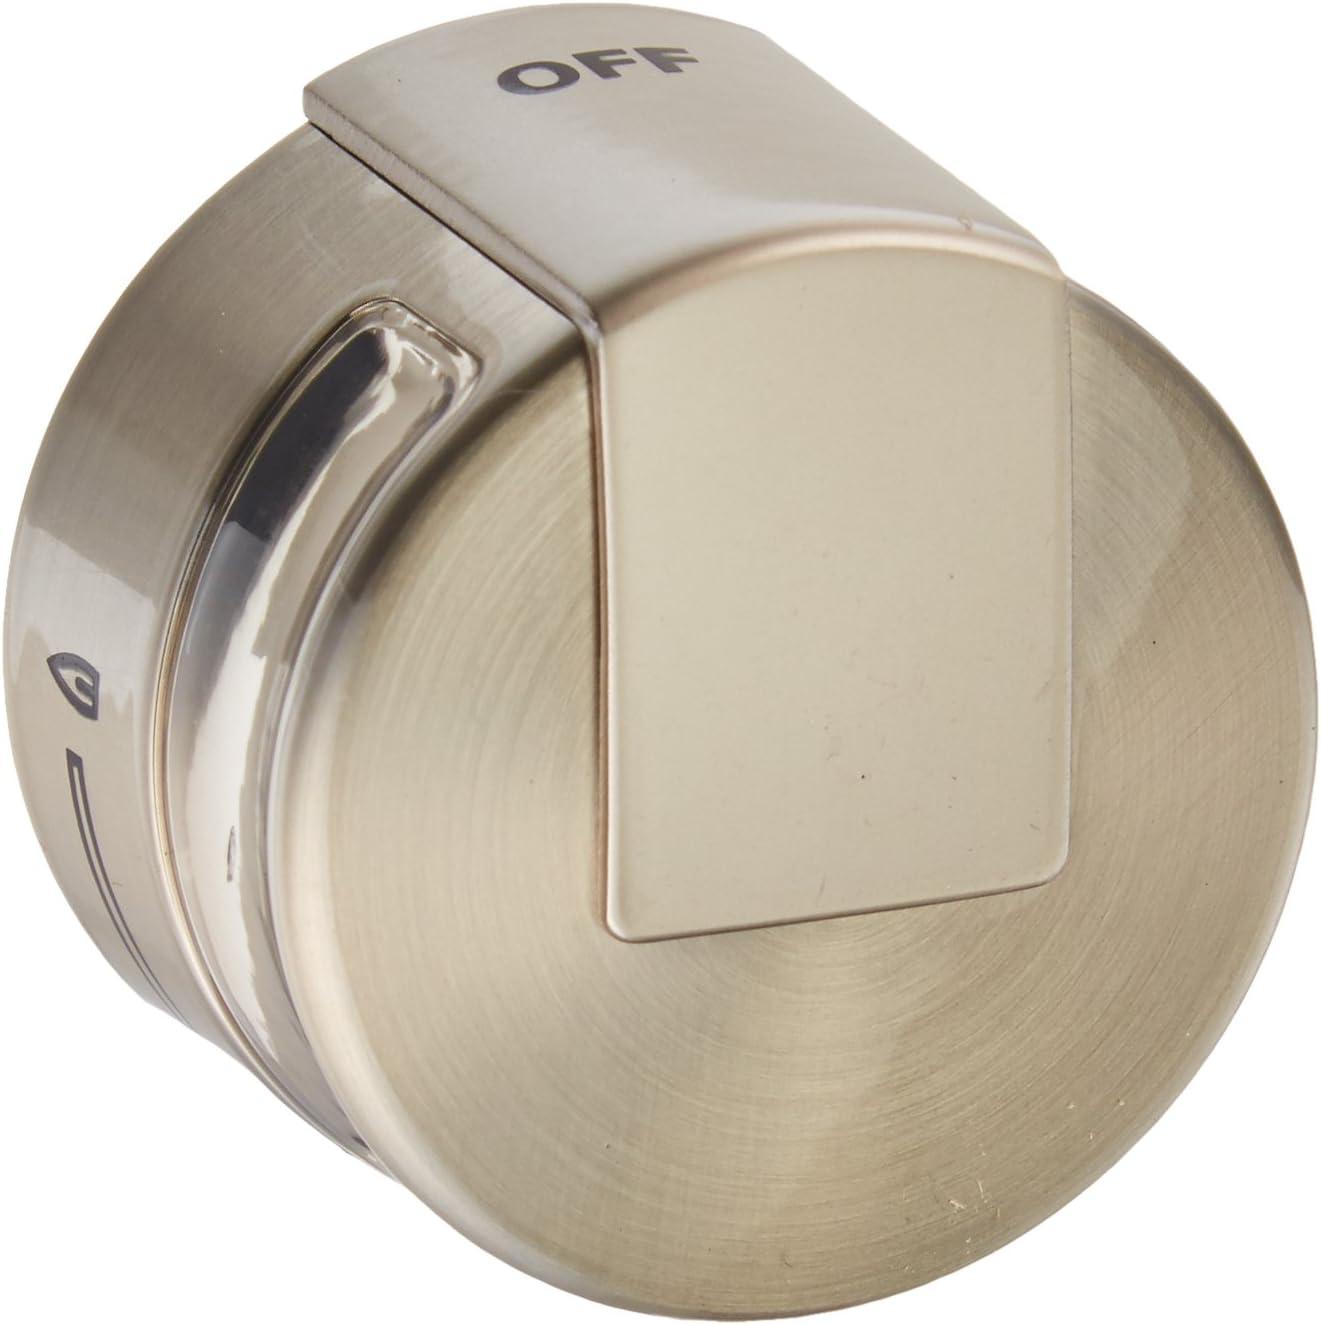 GENUINE Frigidaire 316535702 Range Control mart Knob Spring new work Oven Stove